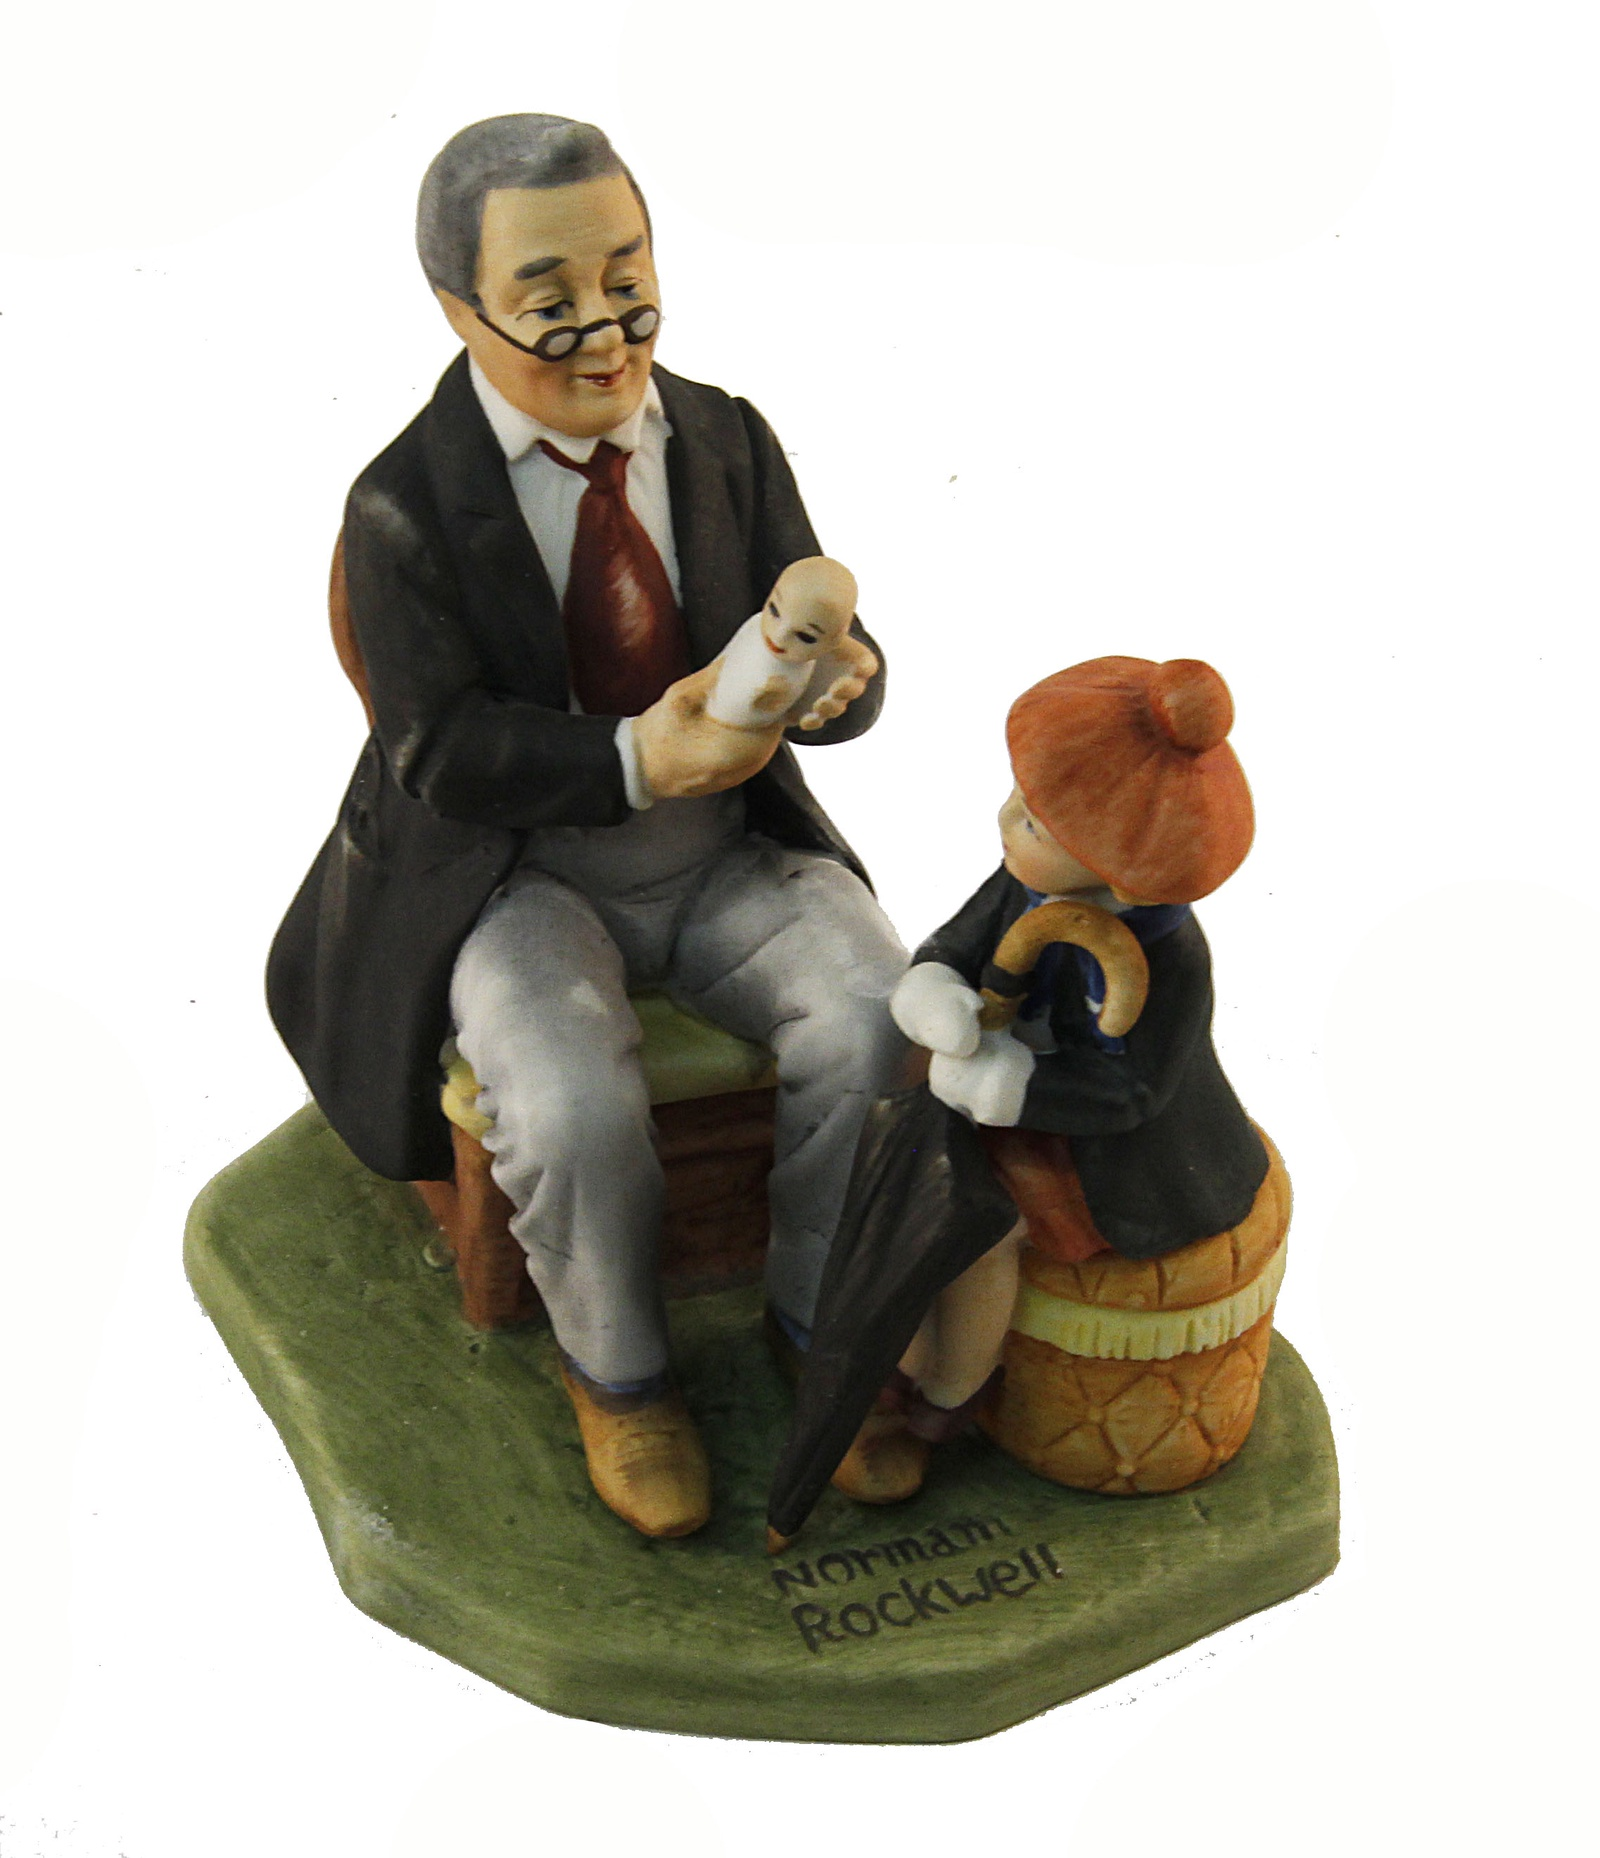 "Норман Роквелл. Декоративная коллекционная статуэтка ""Доктор и кукла"". Фарфор, роспись. Япония, конец ХХ века"